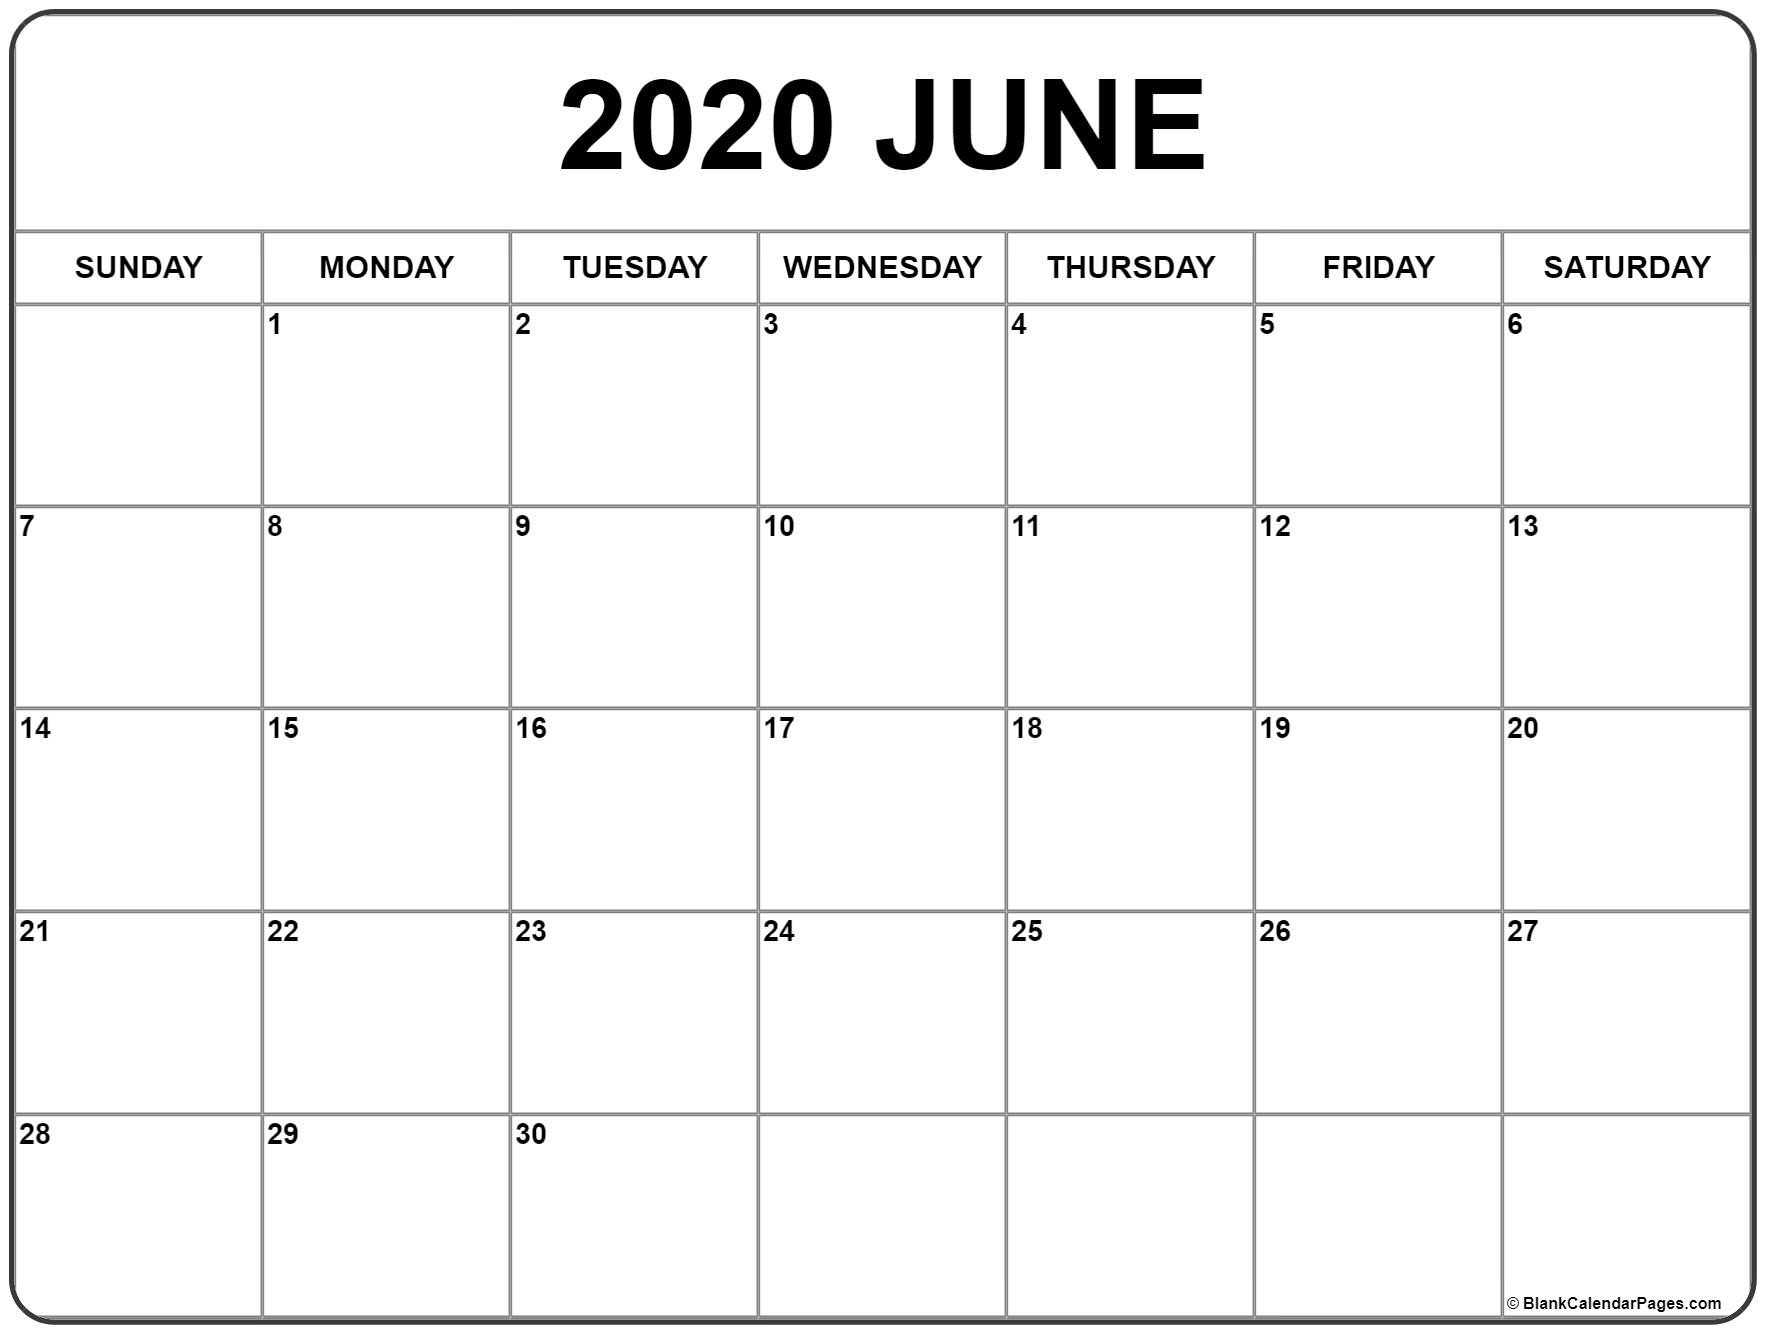 June 2020 Calendar | Free Printable Monthly Calendars-Printable Monthly Calendar June 2020